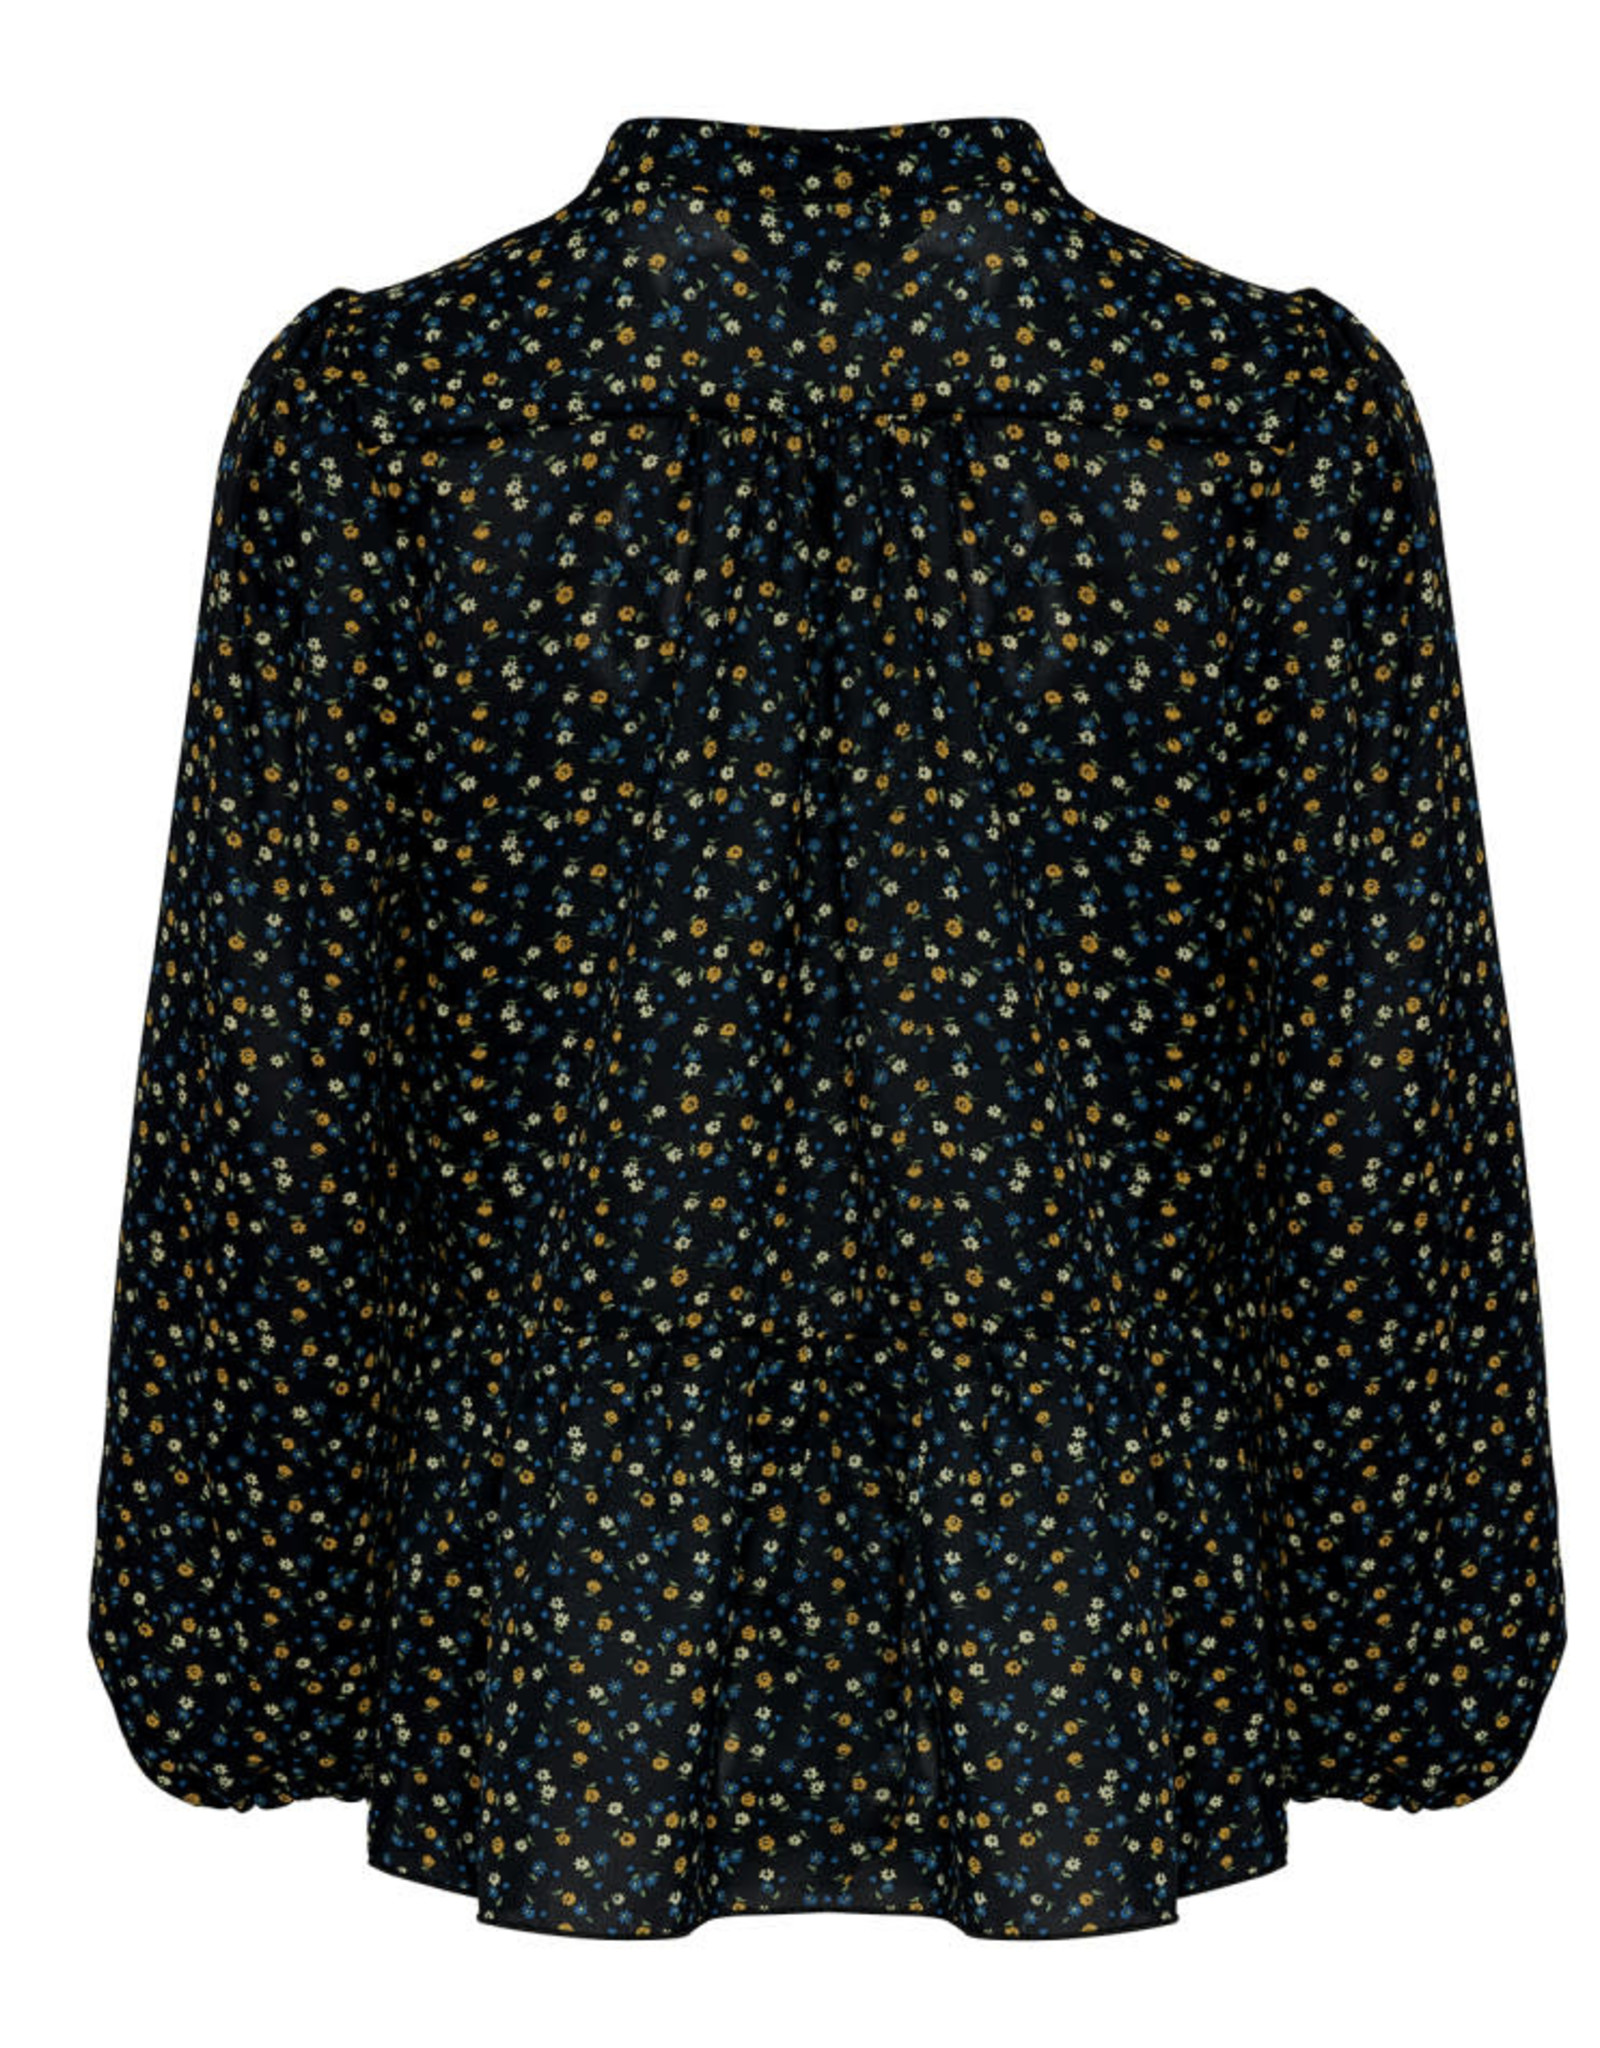 Rose terra/blue blouse